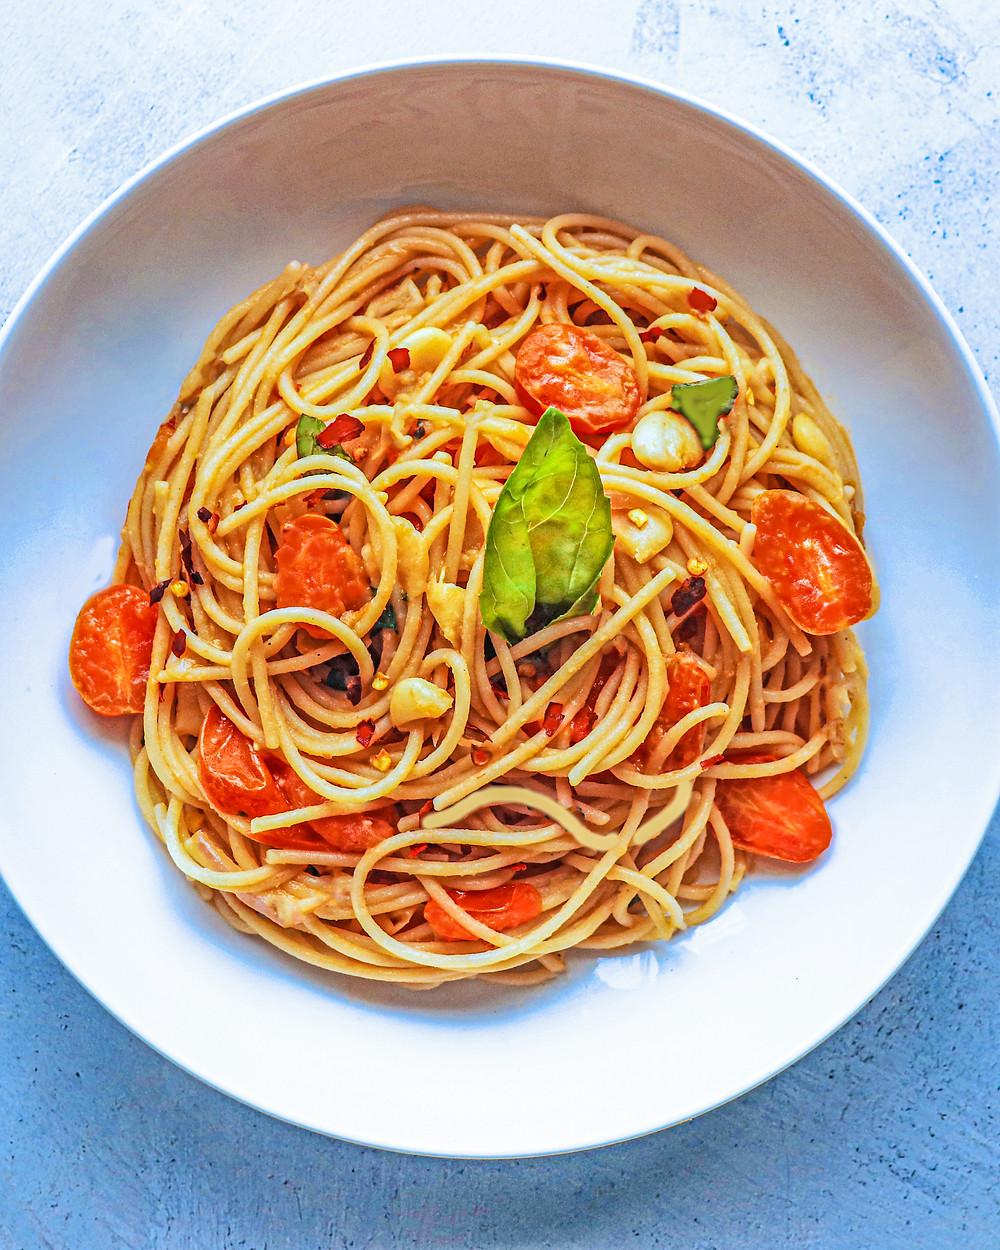 Tomato Basil Spaghetti with Butter Beans - gluten free